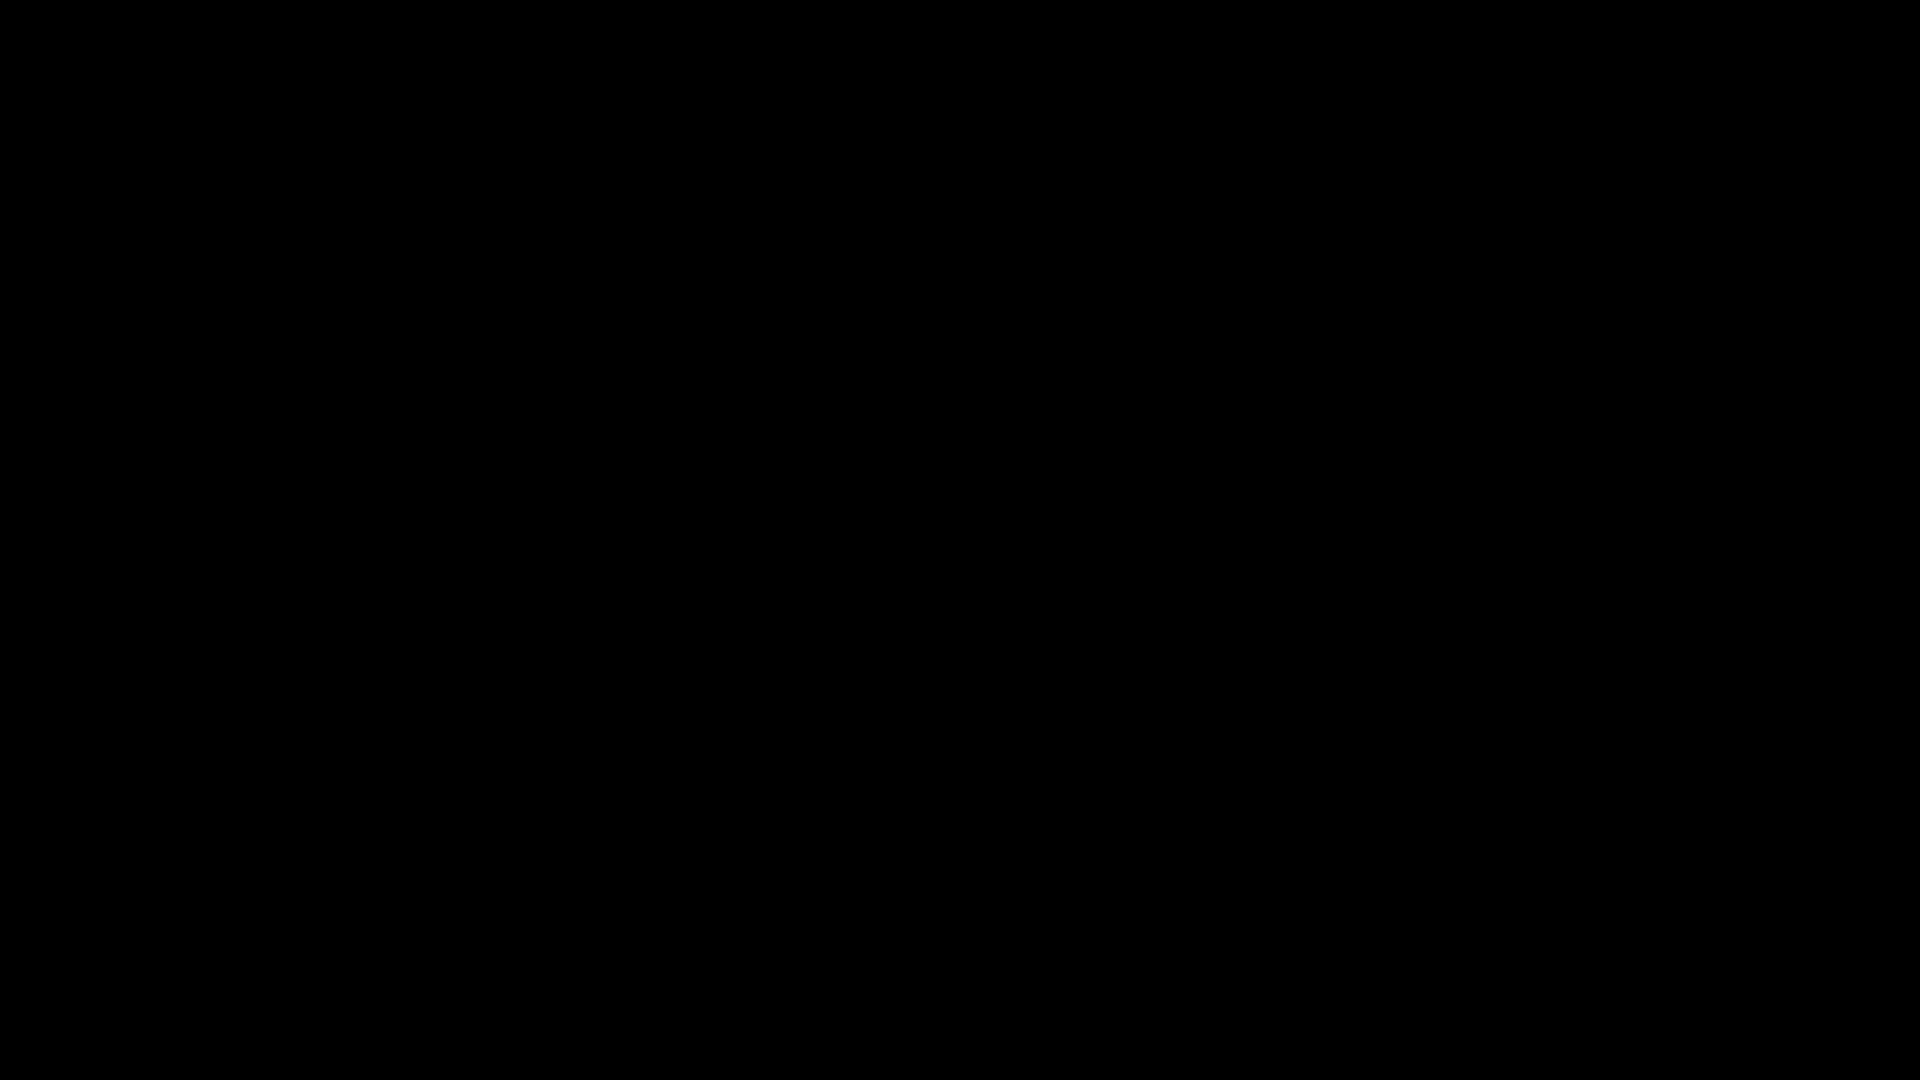 summonerswar, Jack-O'-Lantern GIFs